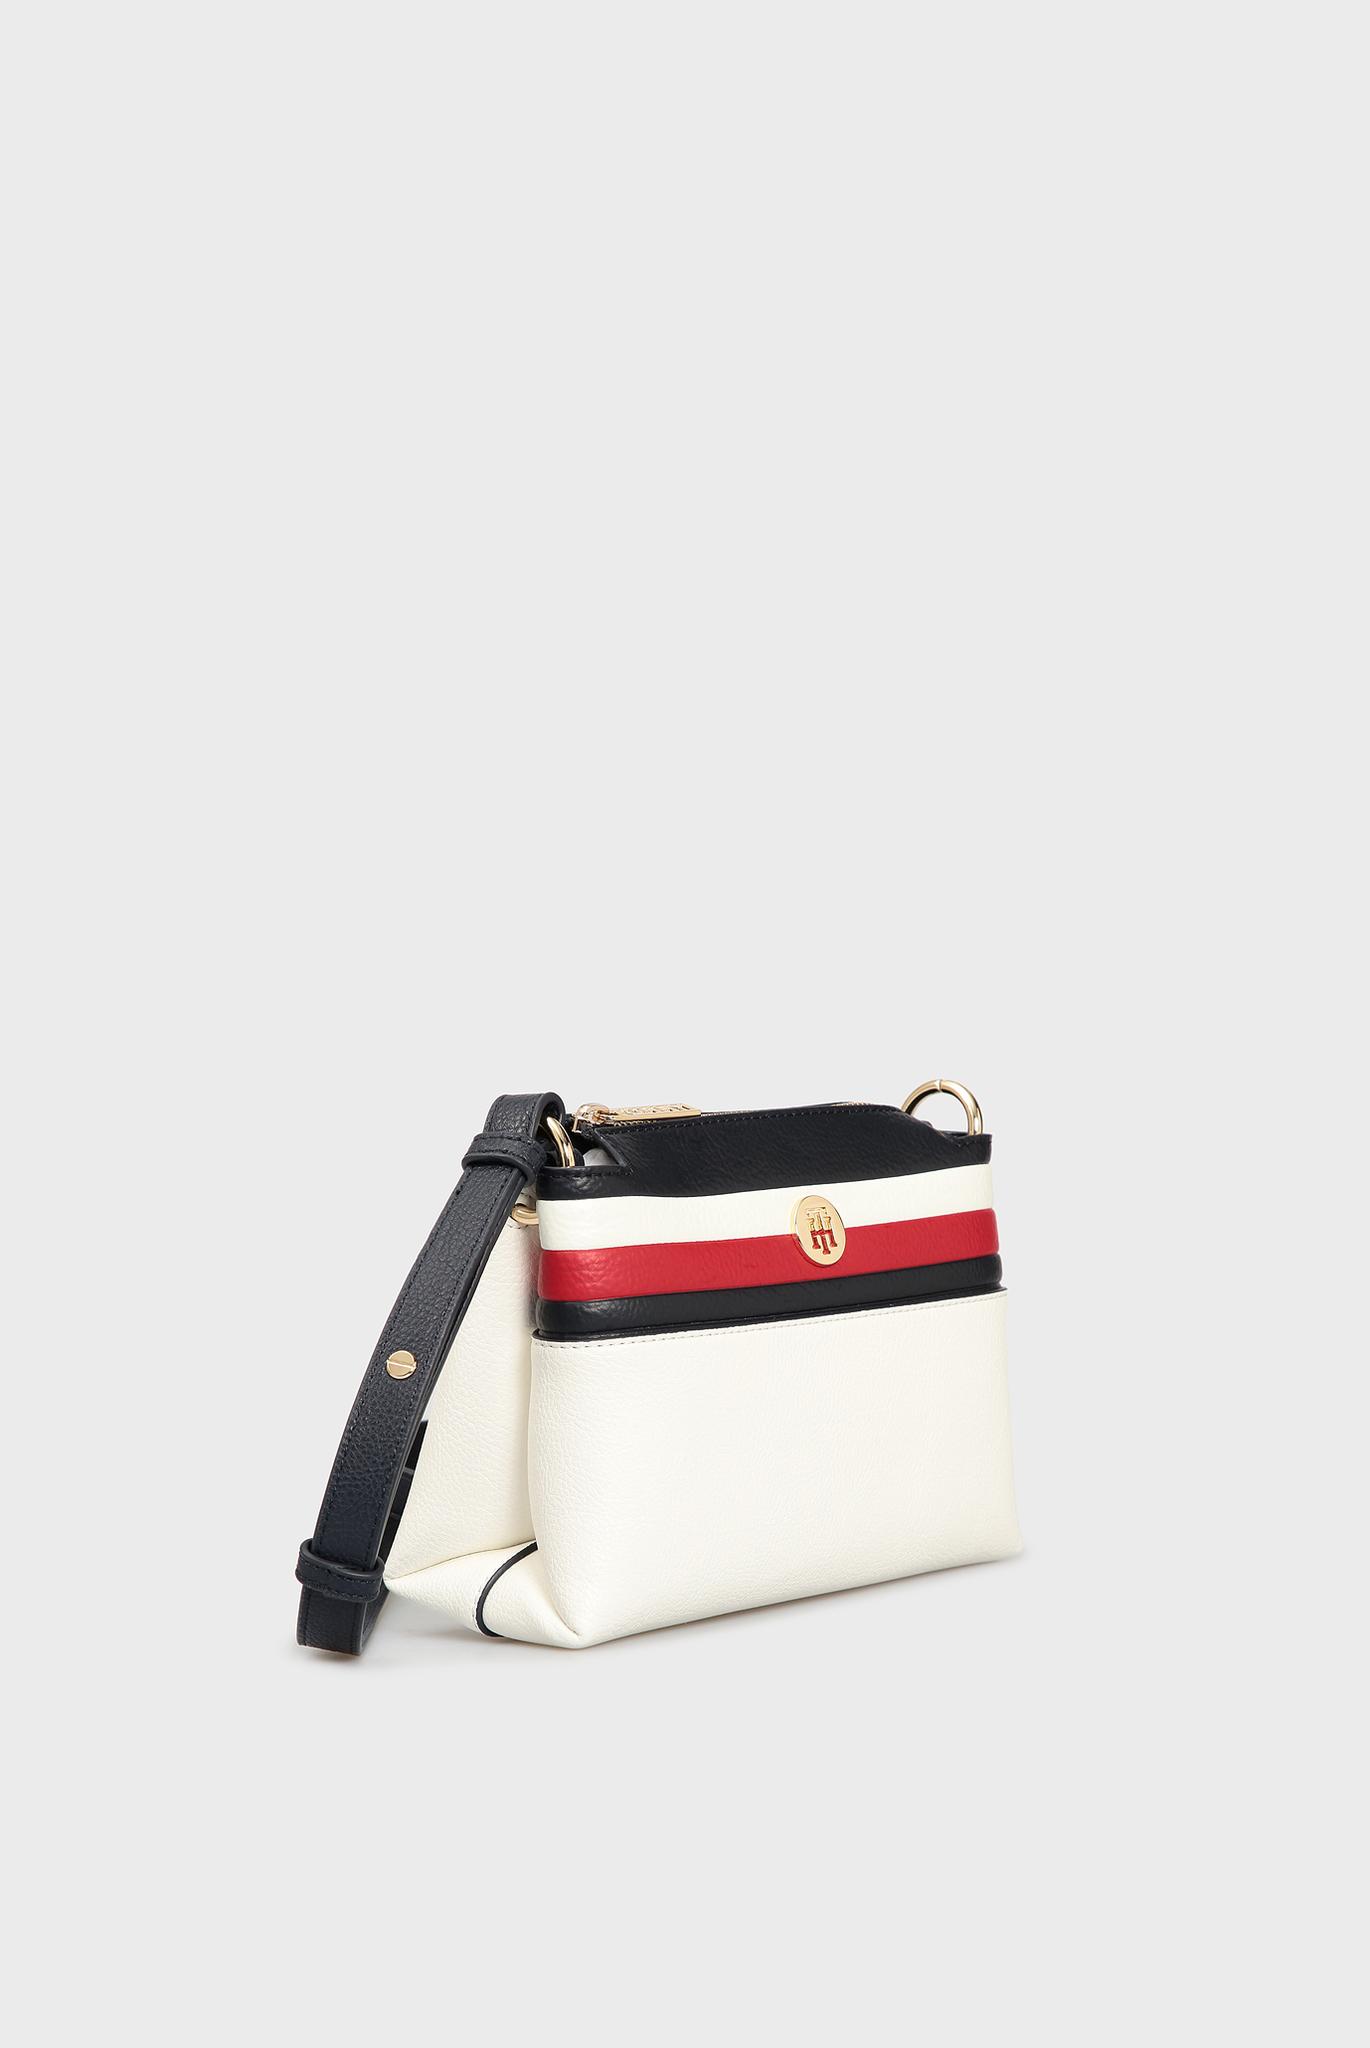 Женская белая сумка через плечо TH CORE CROSSOVER Tommy Hilfiger